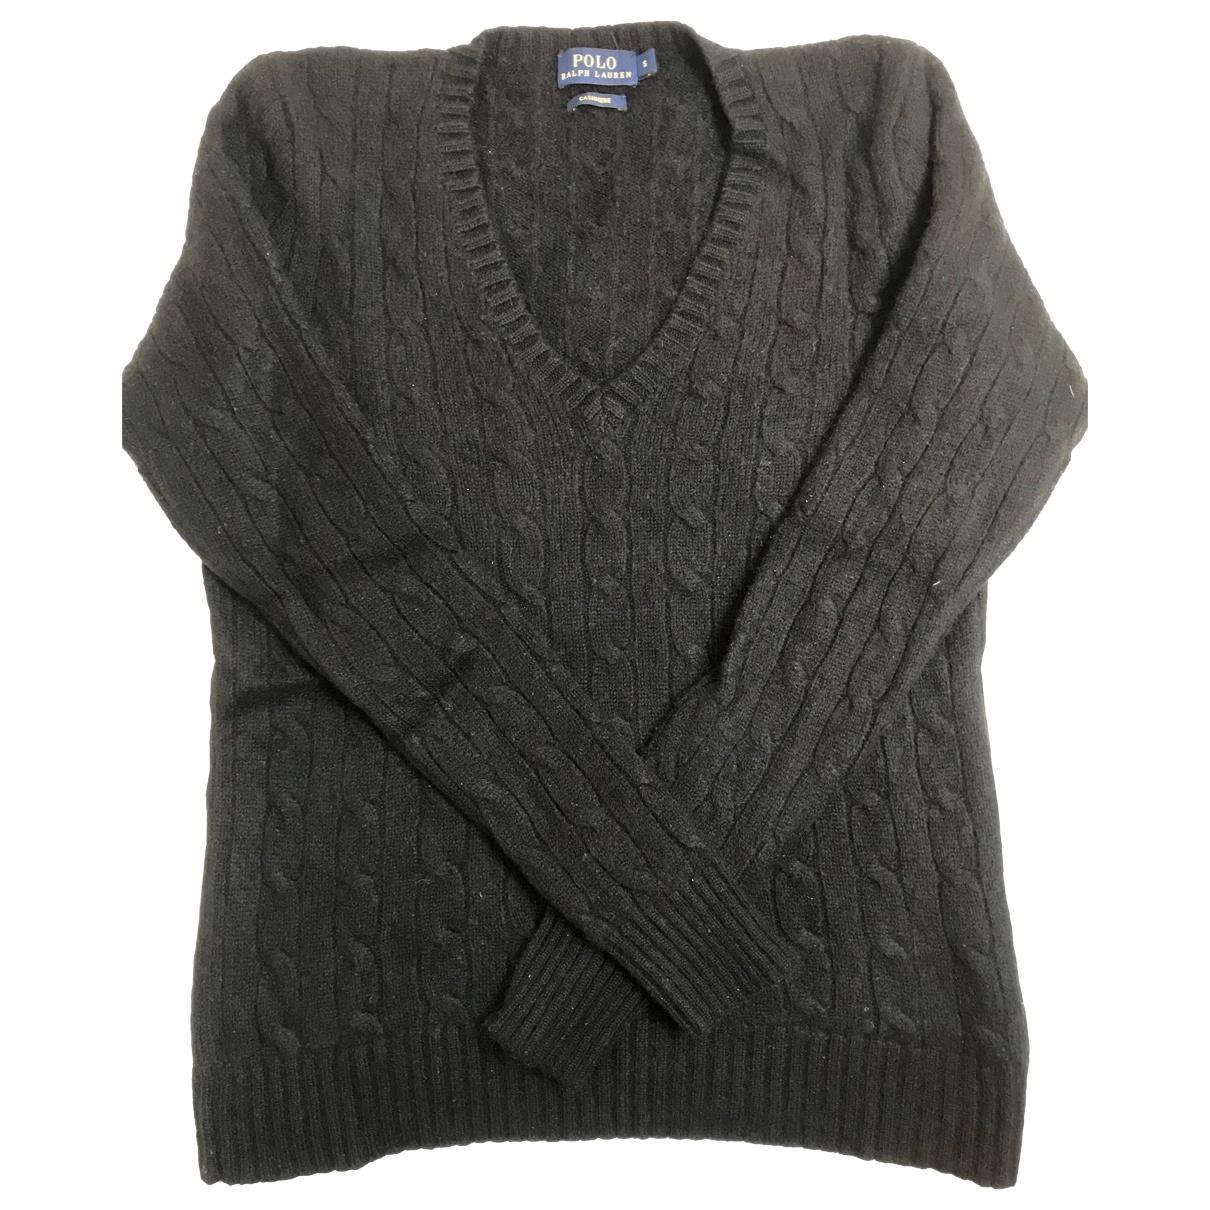 Polo Ralph Lauren \N Black Cashmere Knitwear for Women S International